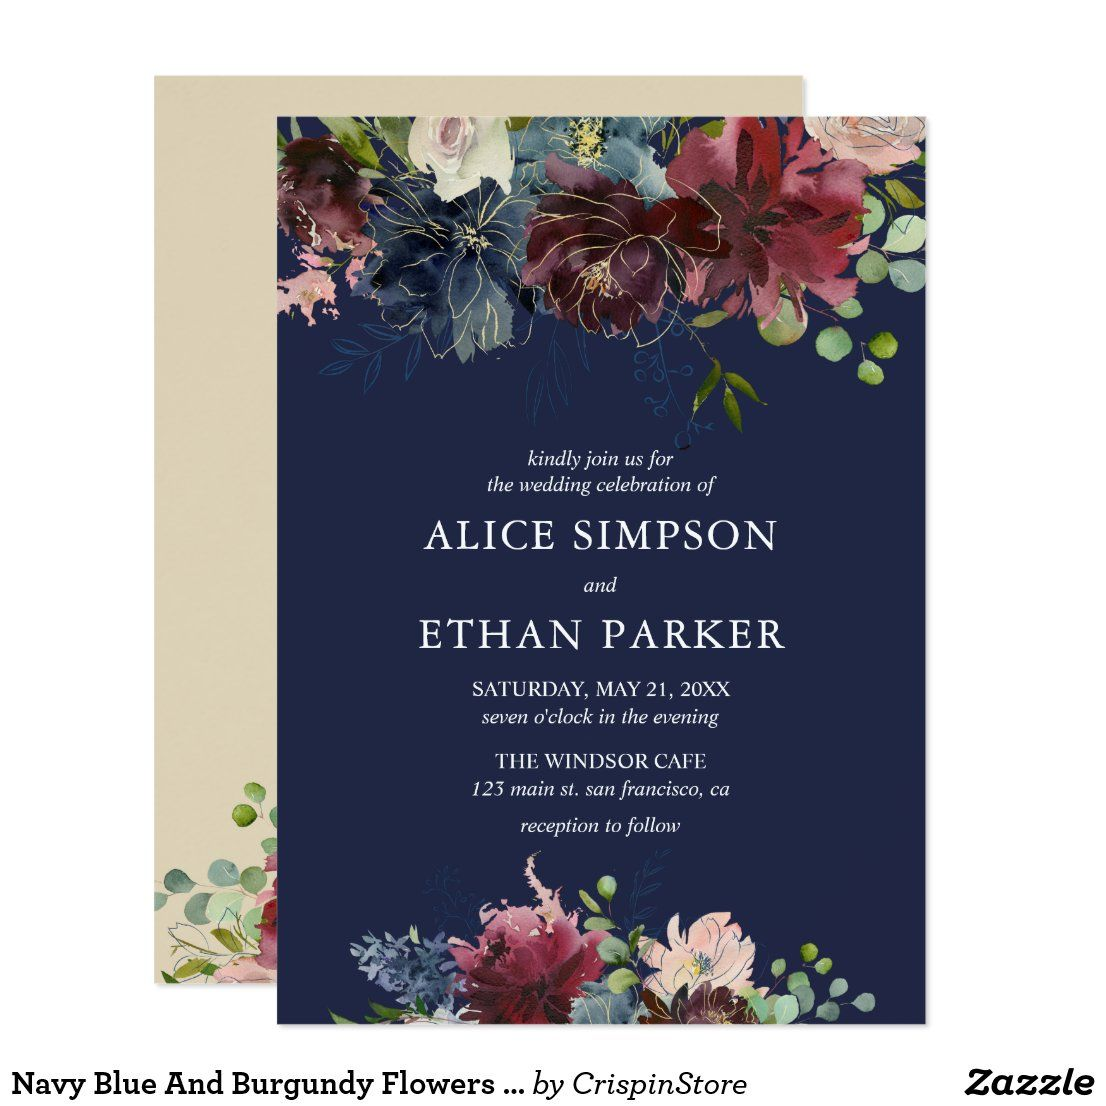 Navy Blue And Burgundy Flowers Wedding Invitation Zazzle